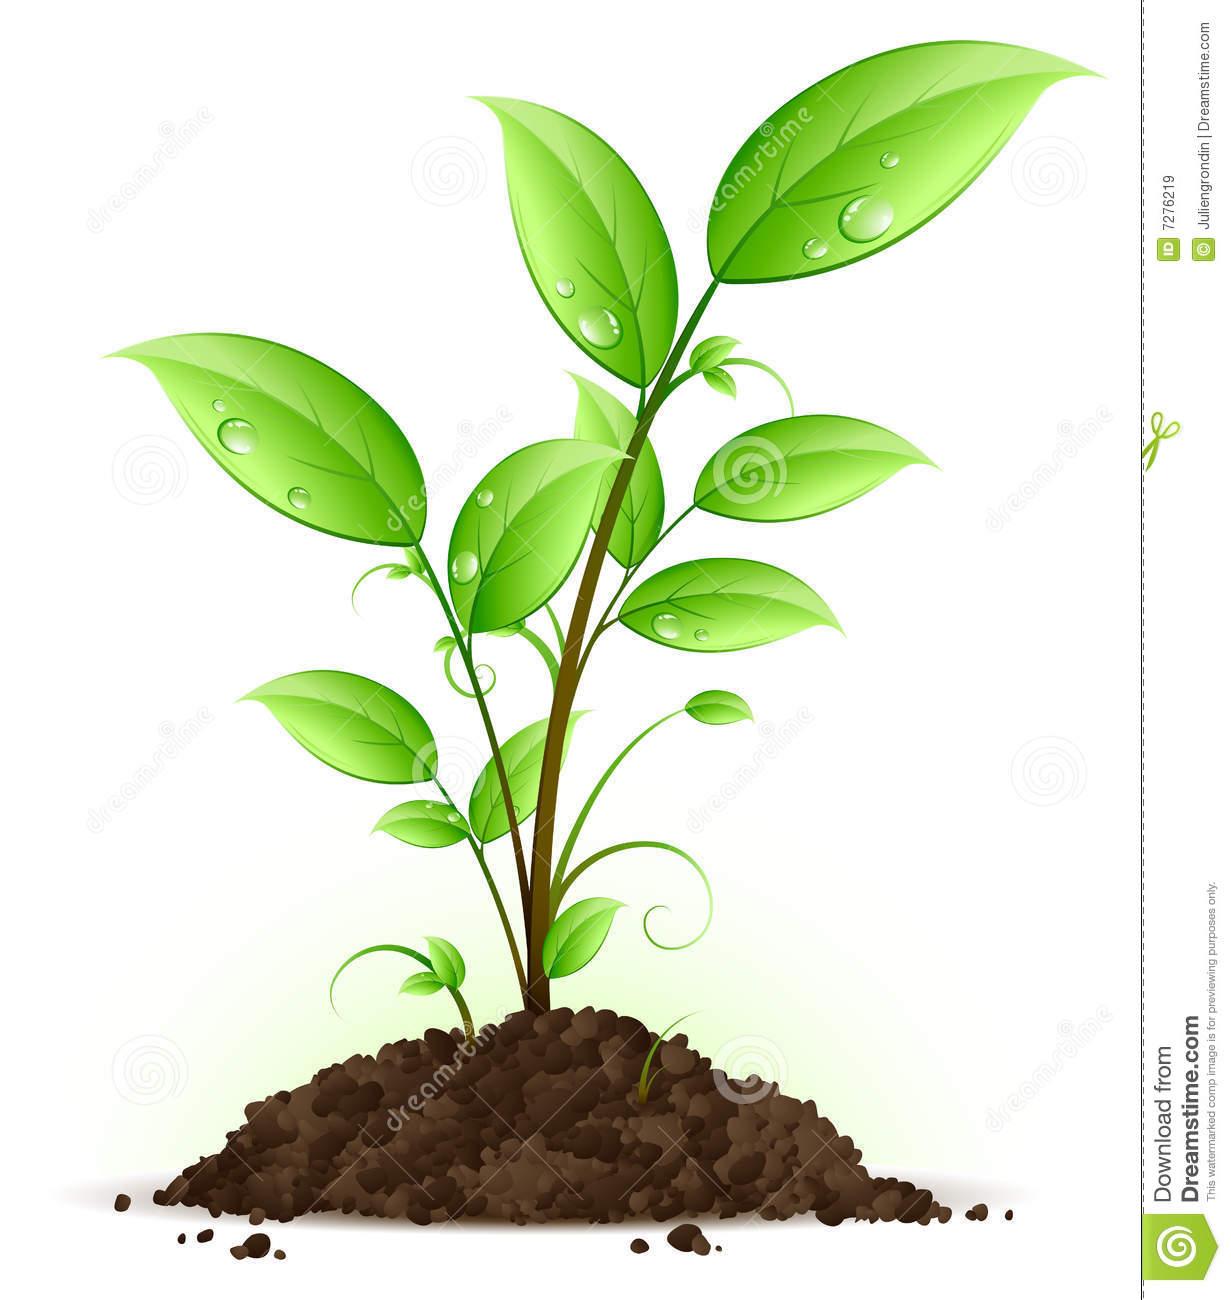 ihmc public cmaps 2 On plantas plantas